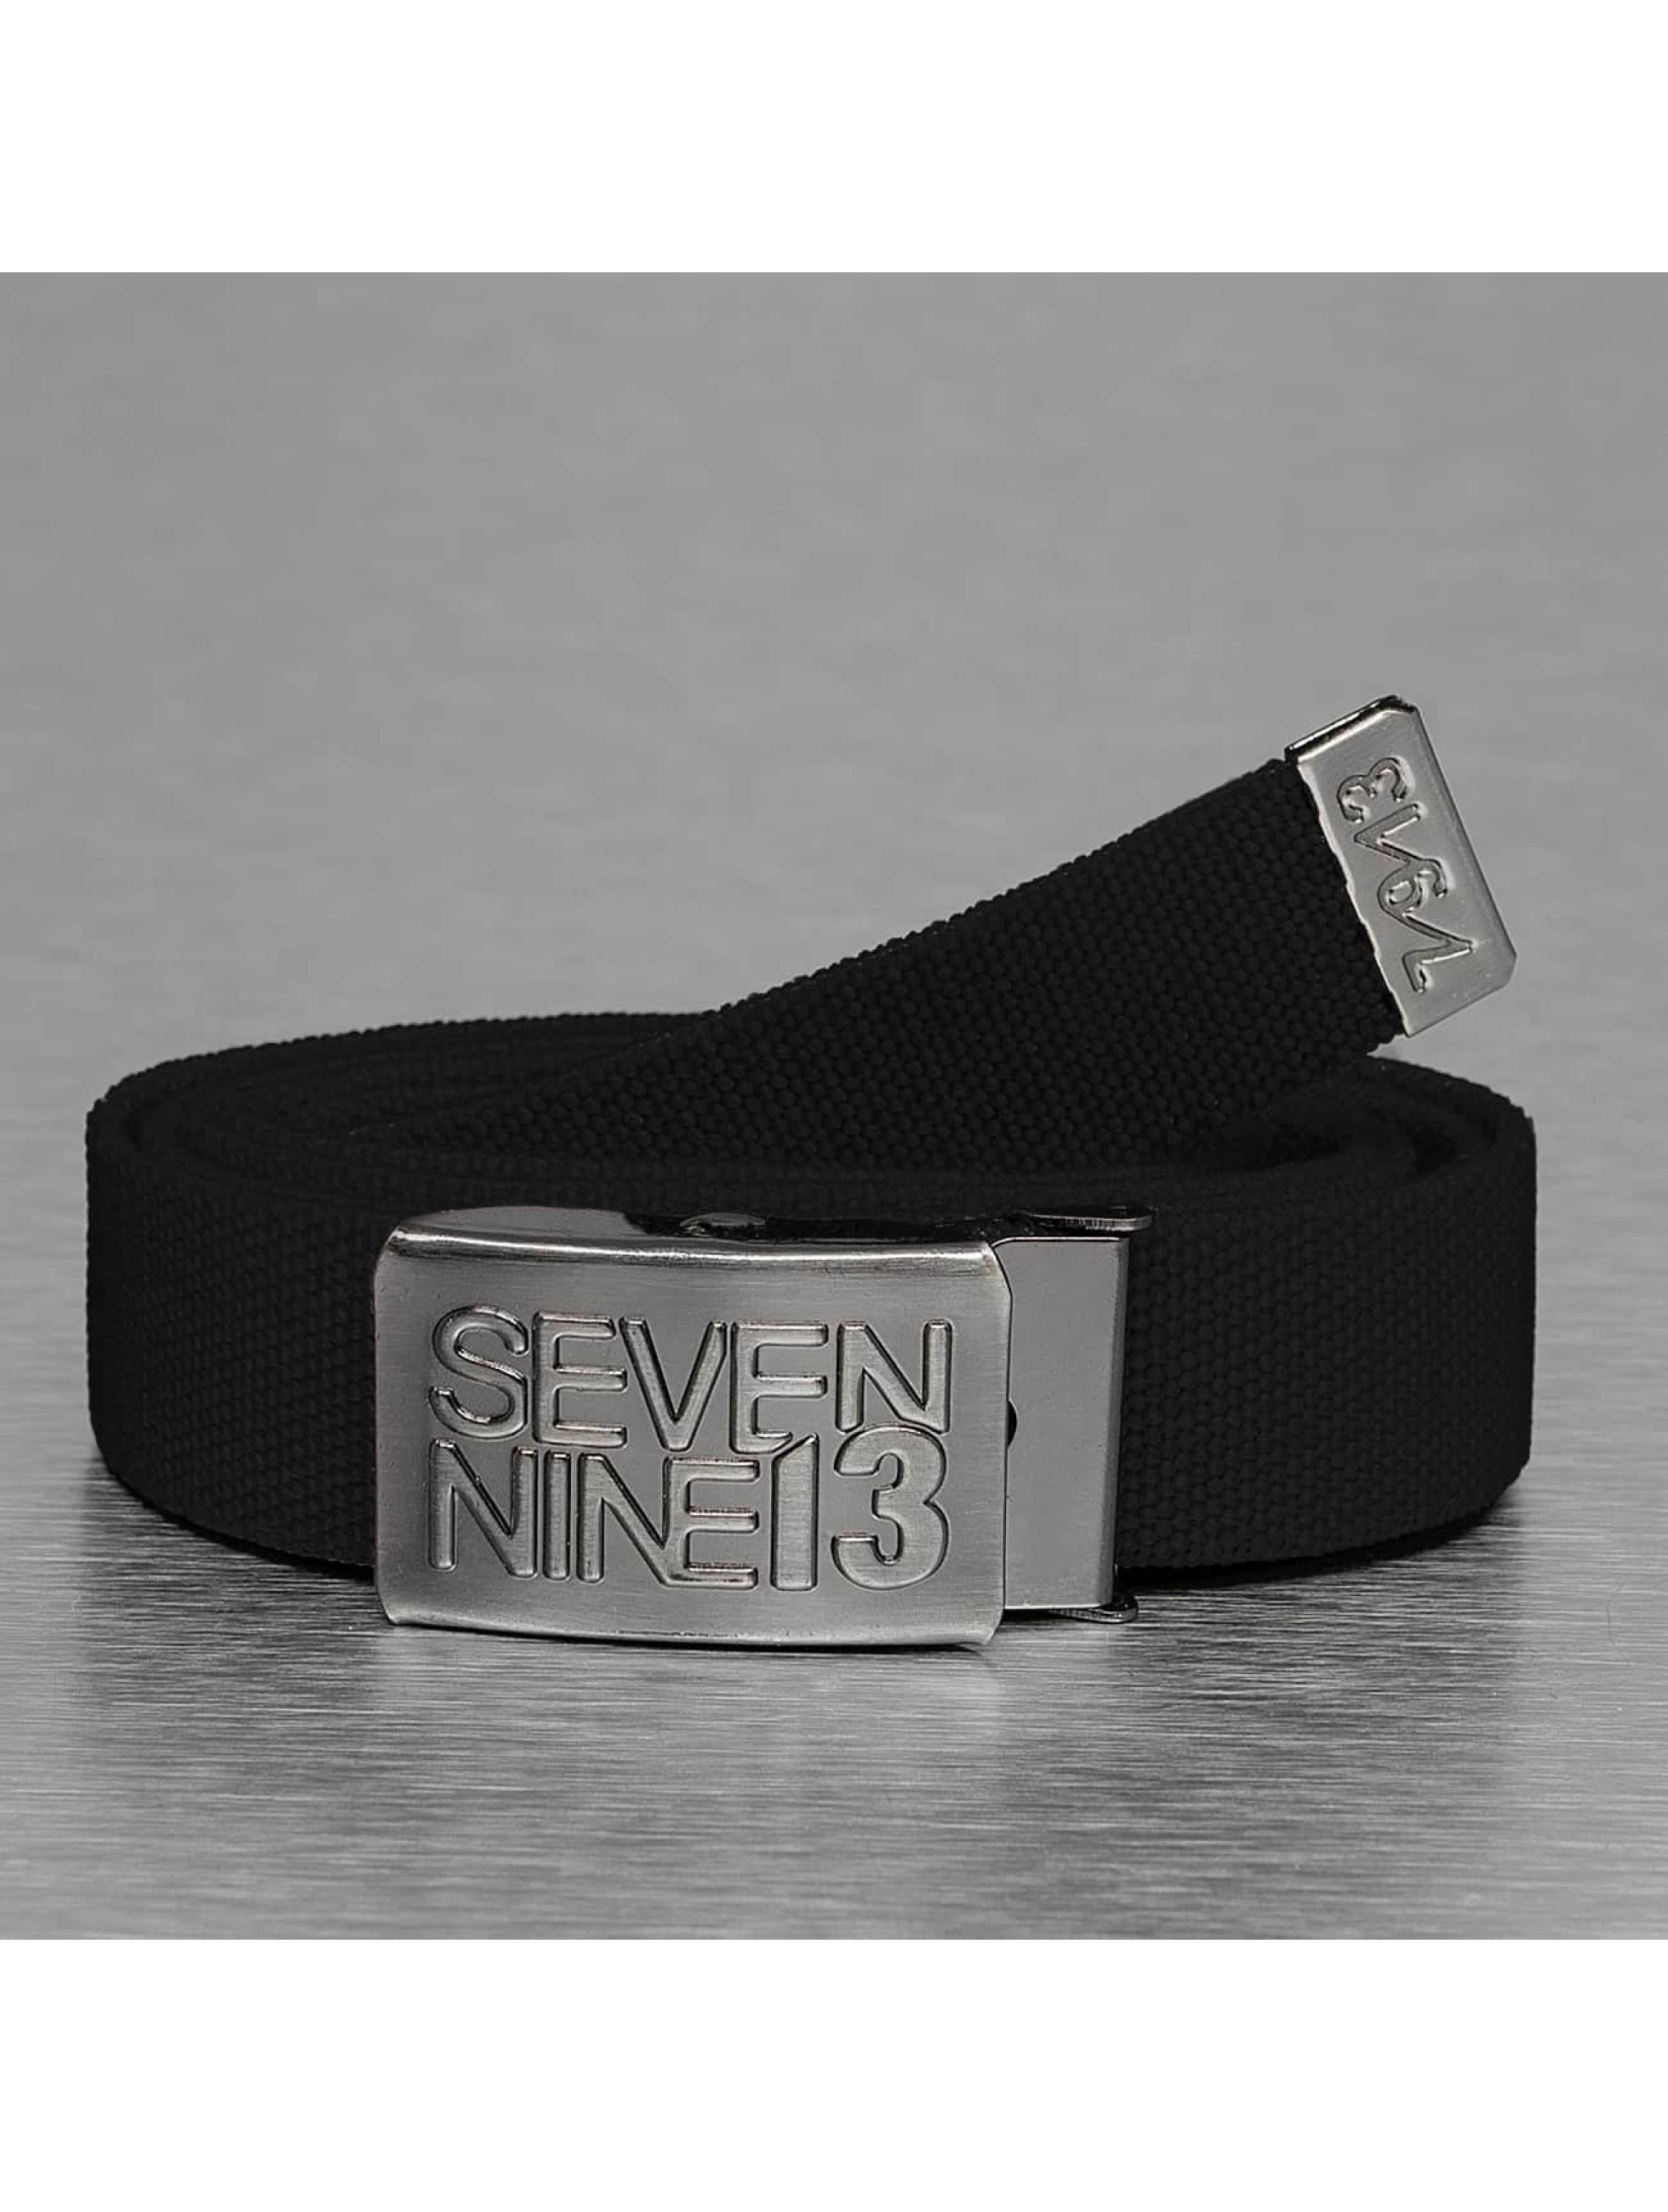 Seven Nine 13 Opasky Jaws Stretch èierna